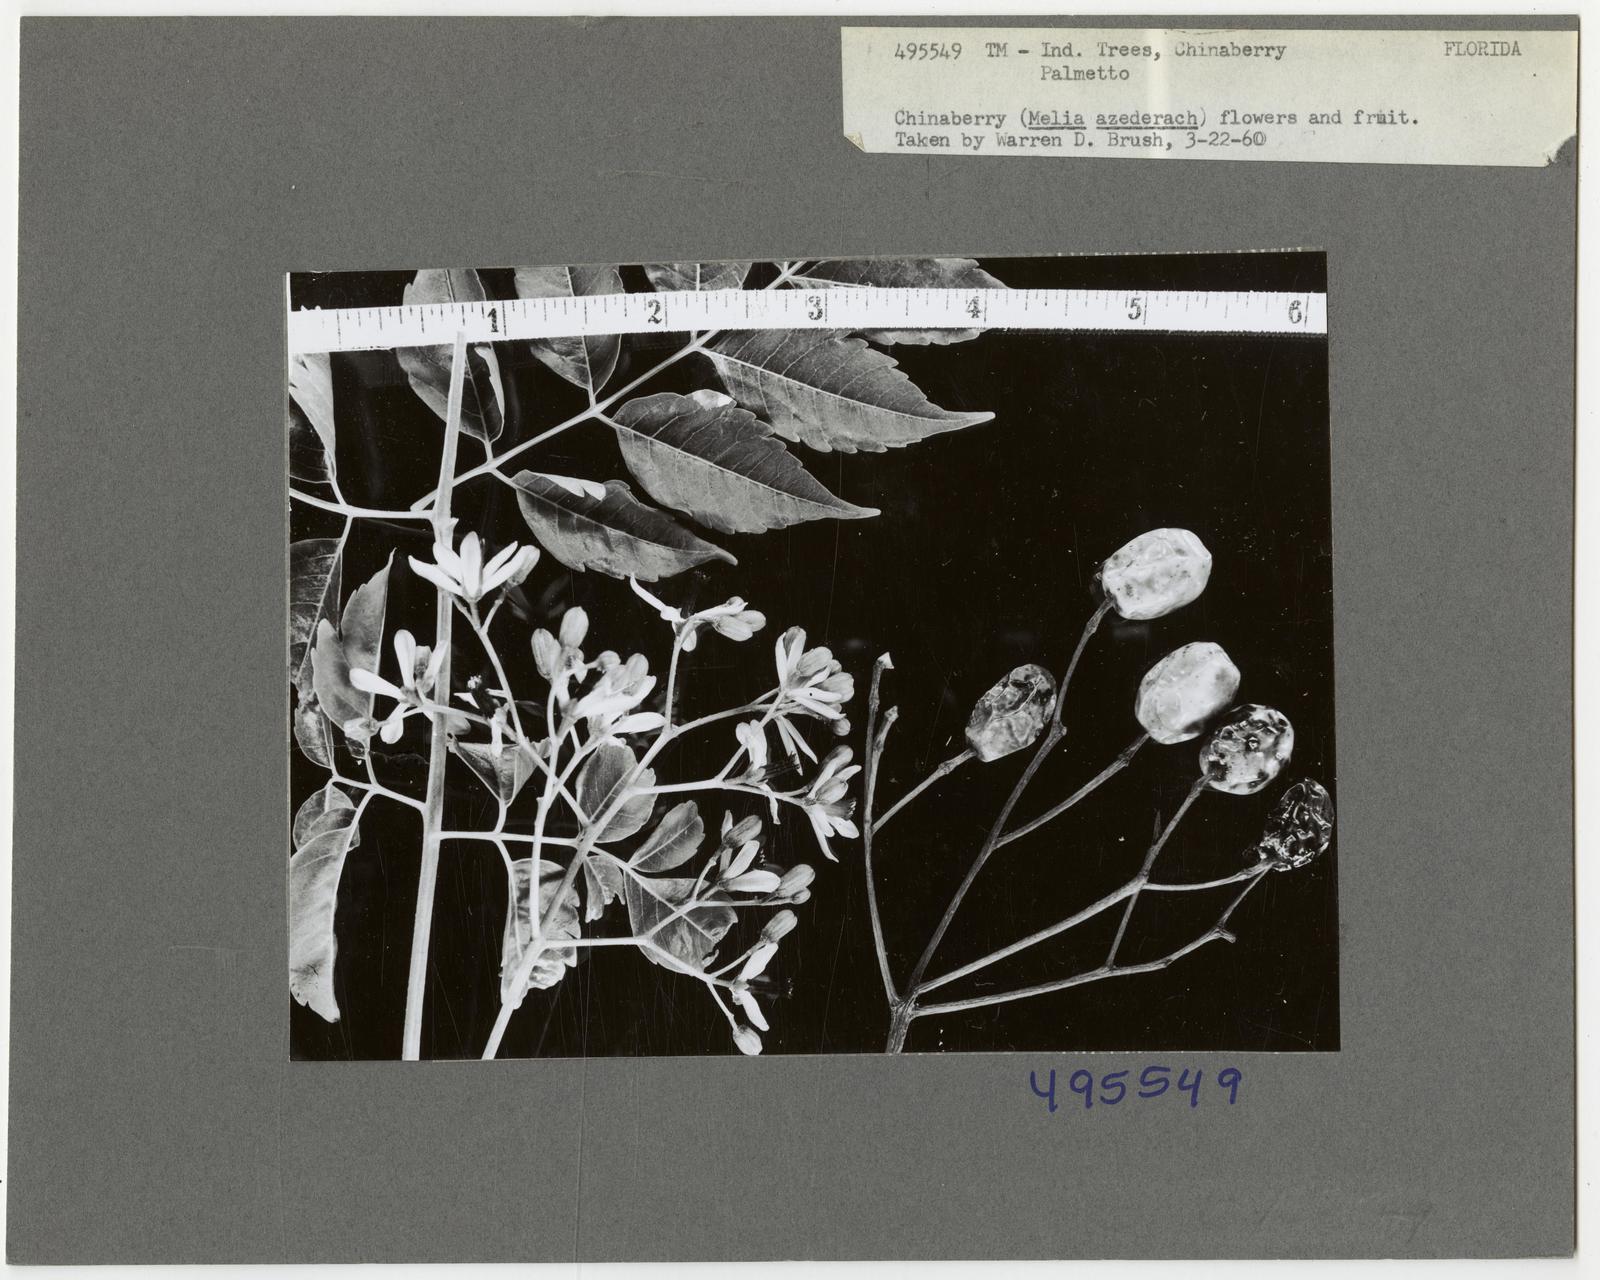 Tree Identification Chinaberry Picryl